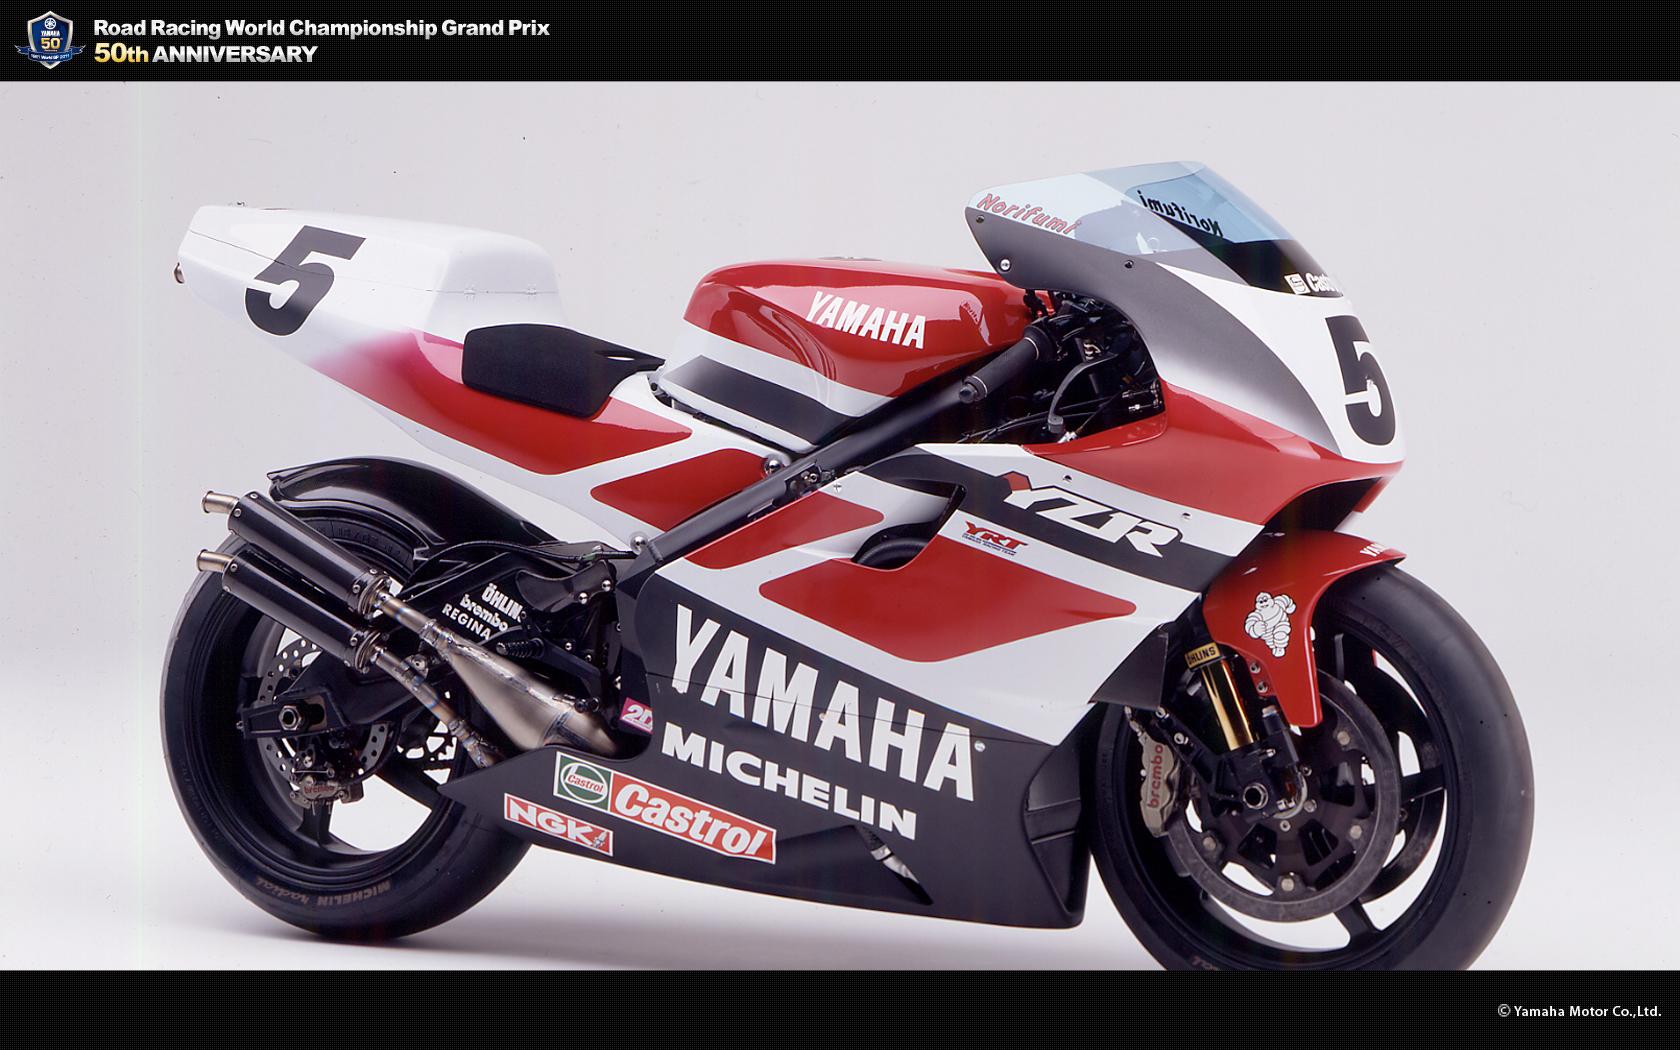 Yzr500 0wh0 Racing Information Yamaha Motor Co Ltd